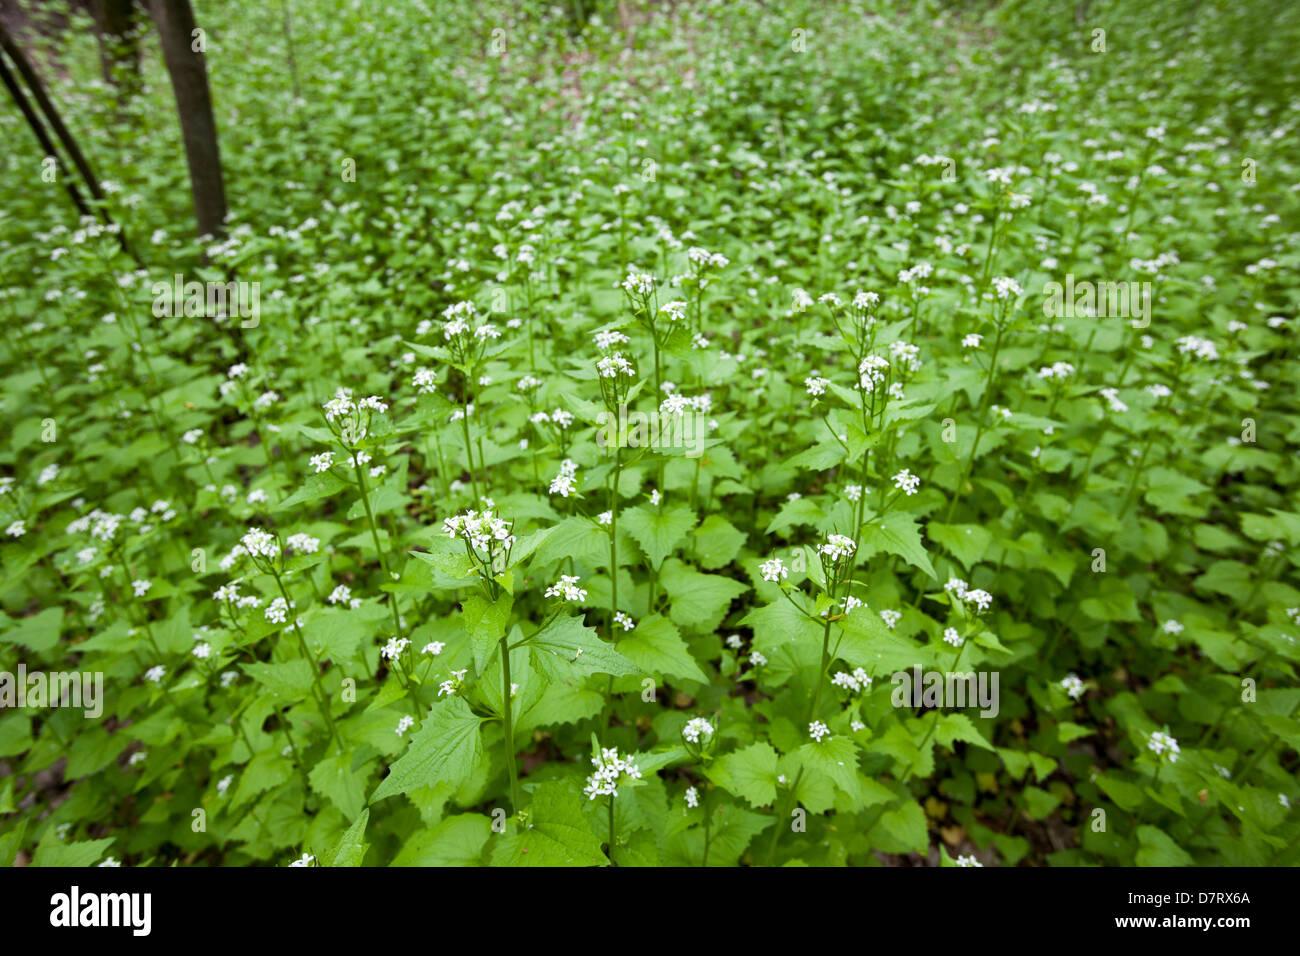 Garlic mustard (Alliaria petiolata), an invasive species, in a city park in Detroit. Stock Photo